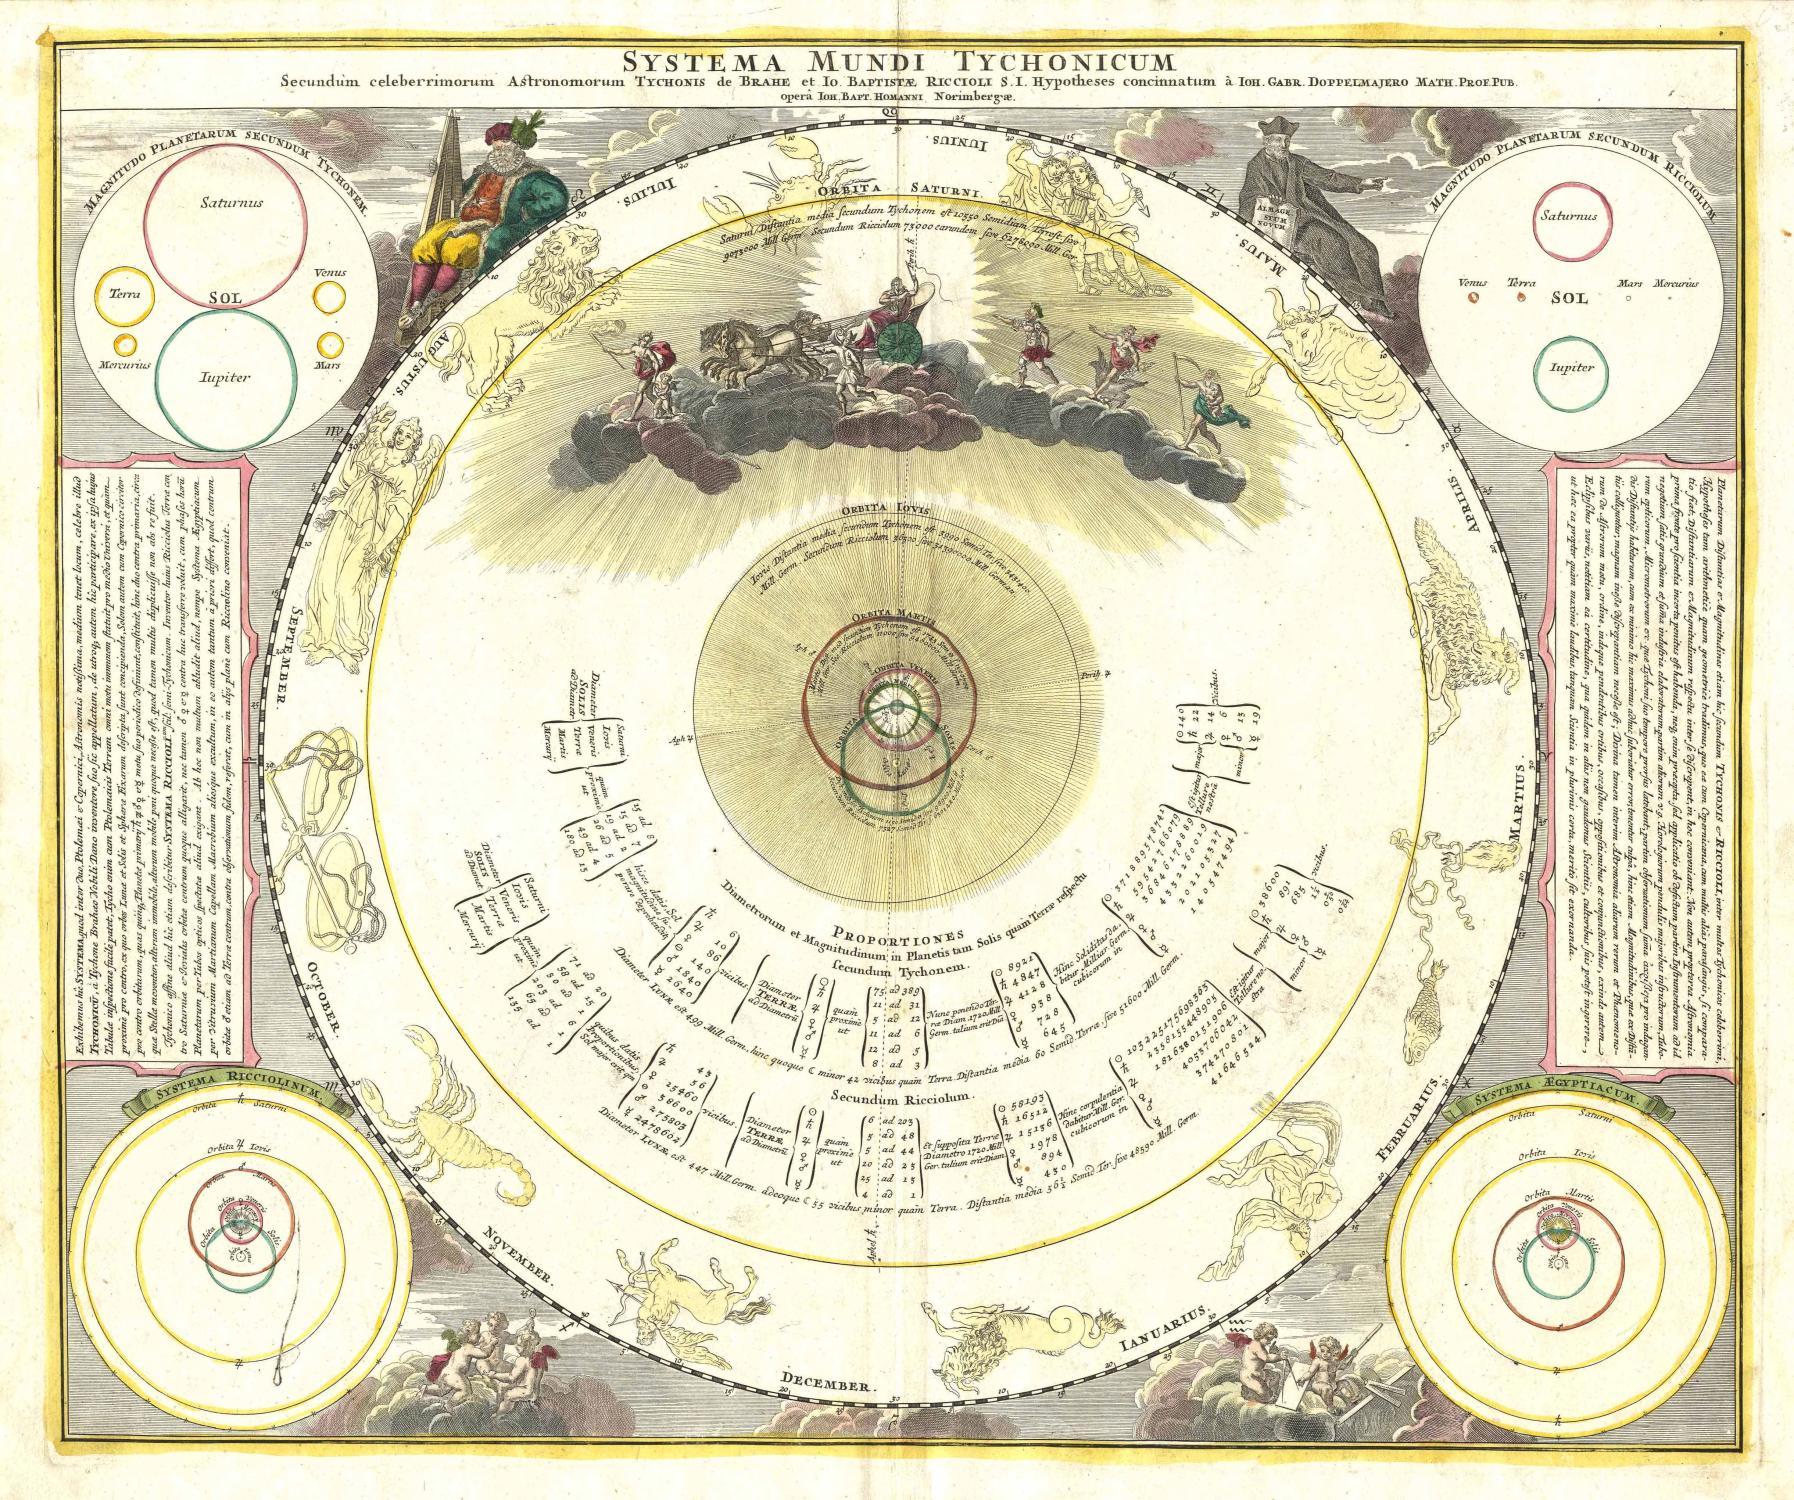 Systema Mundi Tychonicum Secundum celeberrimorum Astronomorum Tychonis de Brahe